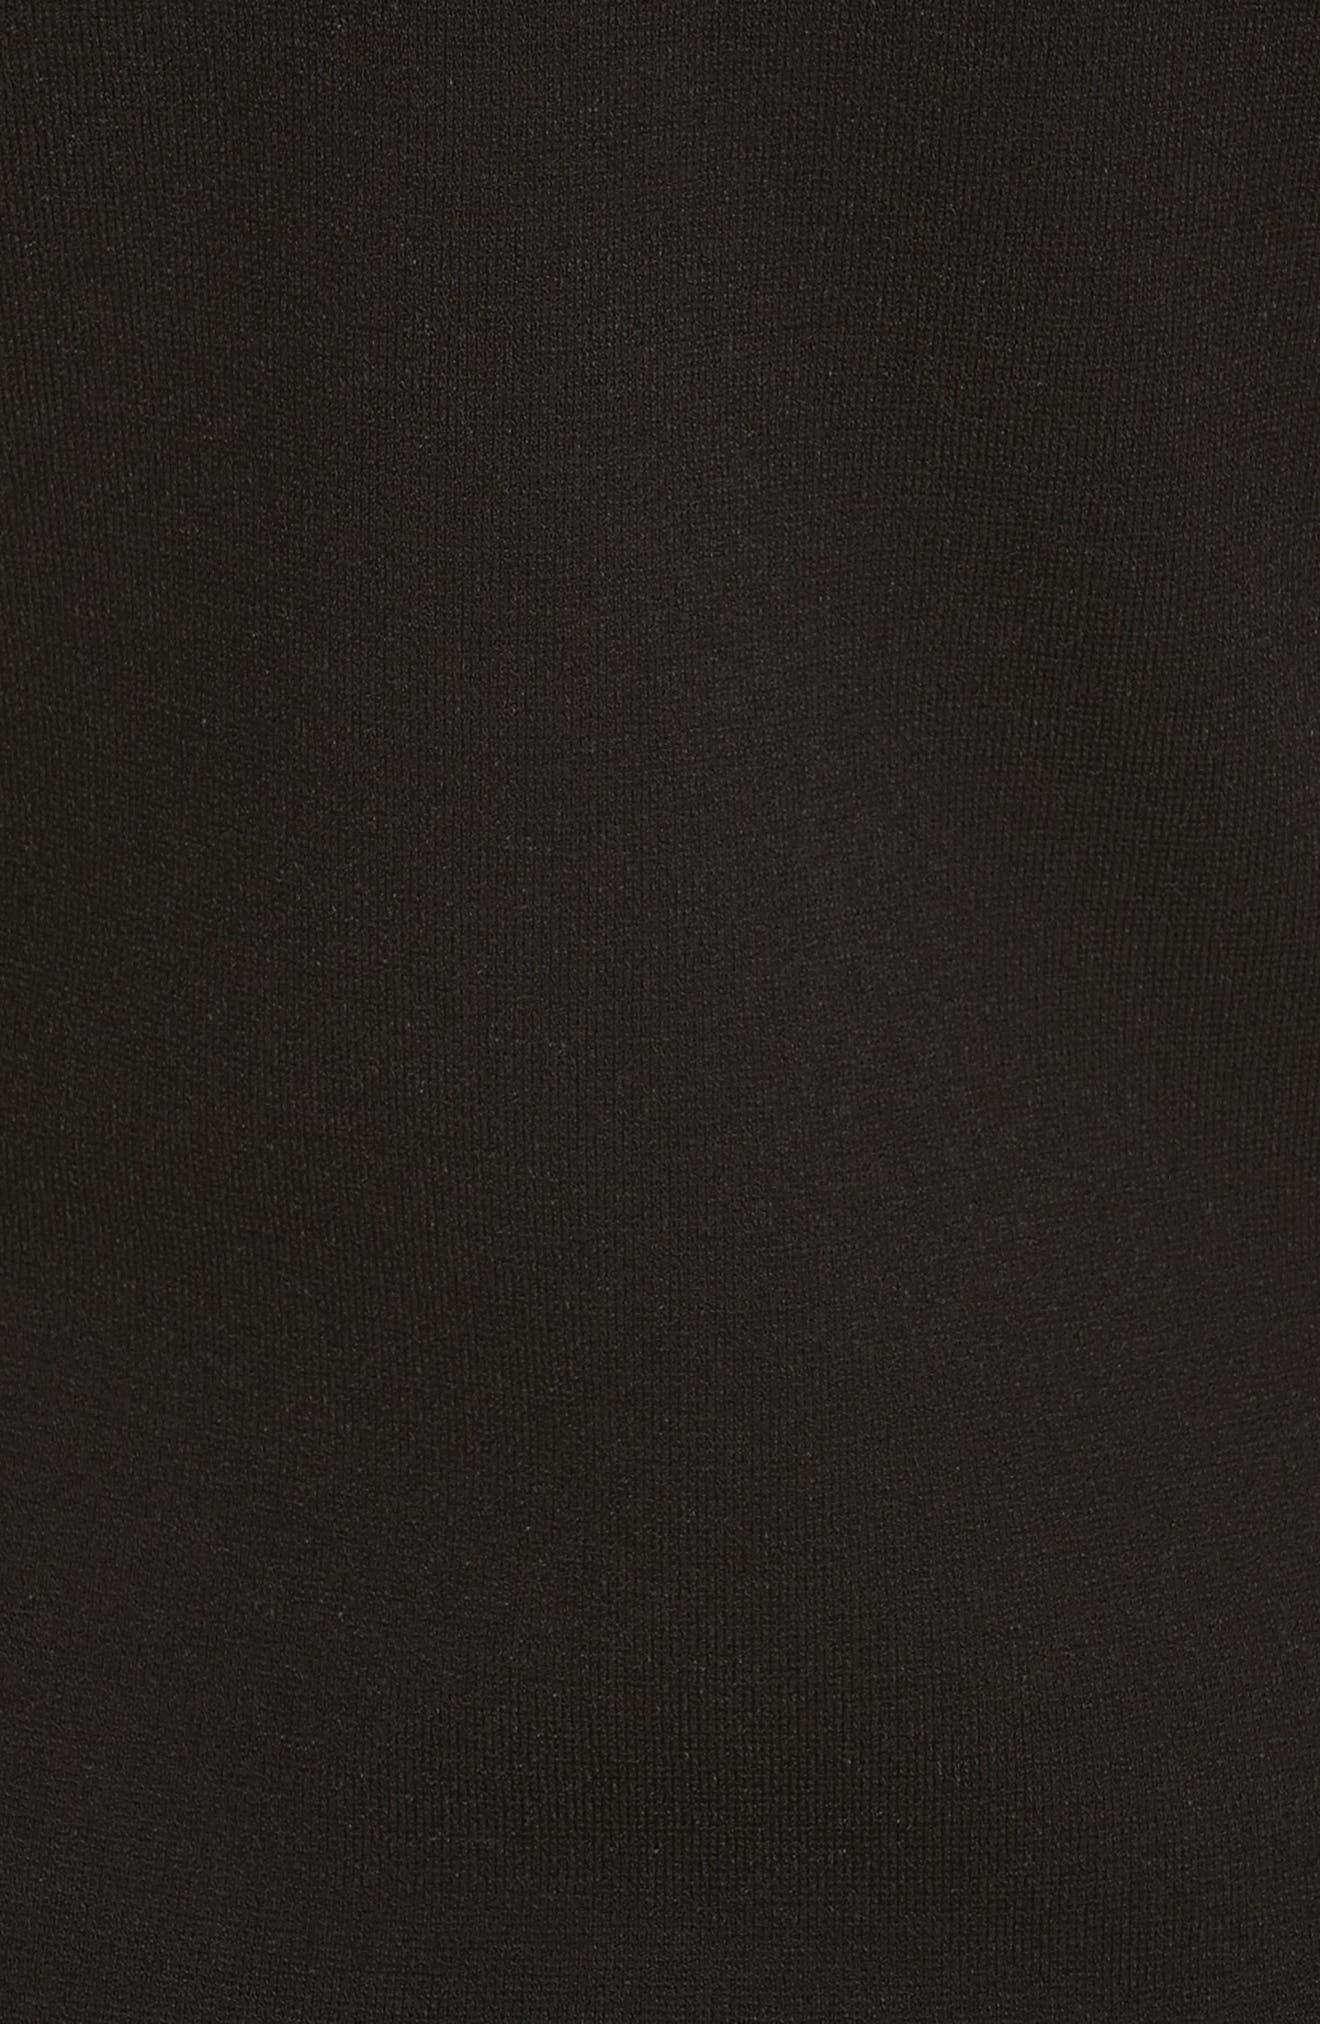 Diane von Furstenberg Long Sleeve Minidress,                             Alternate thumbnail 5, color,                             361